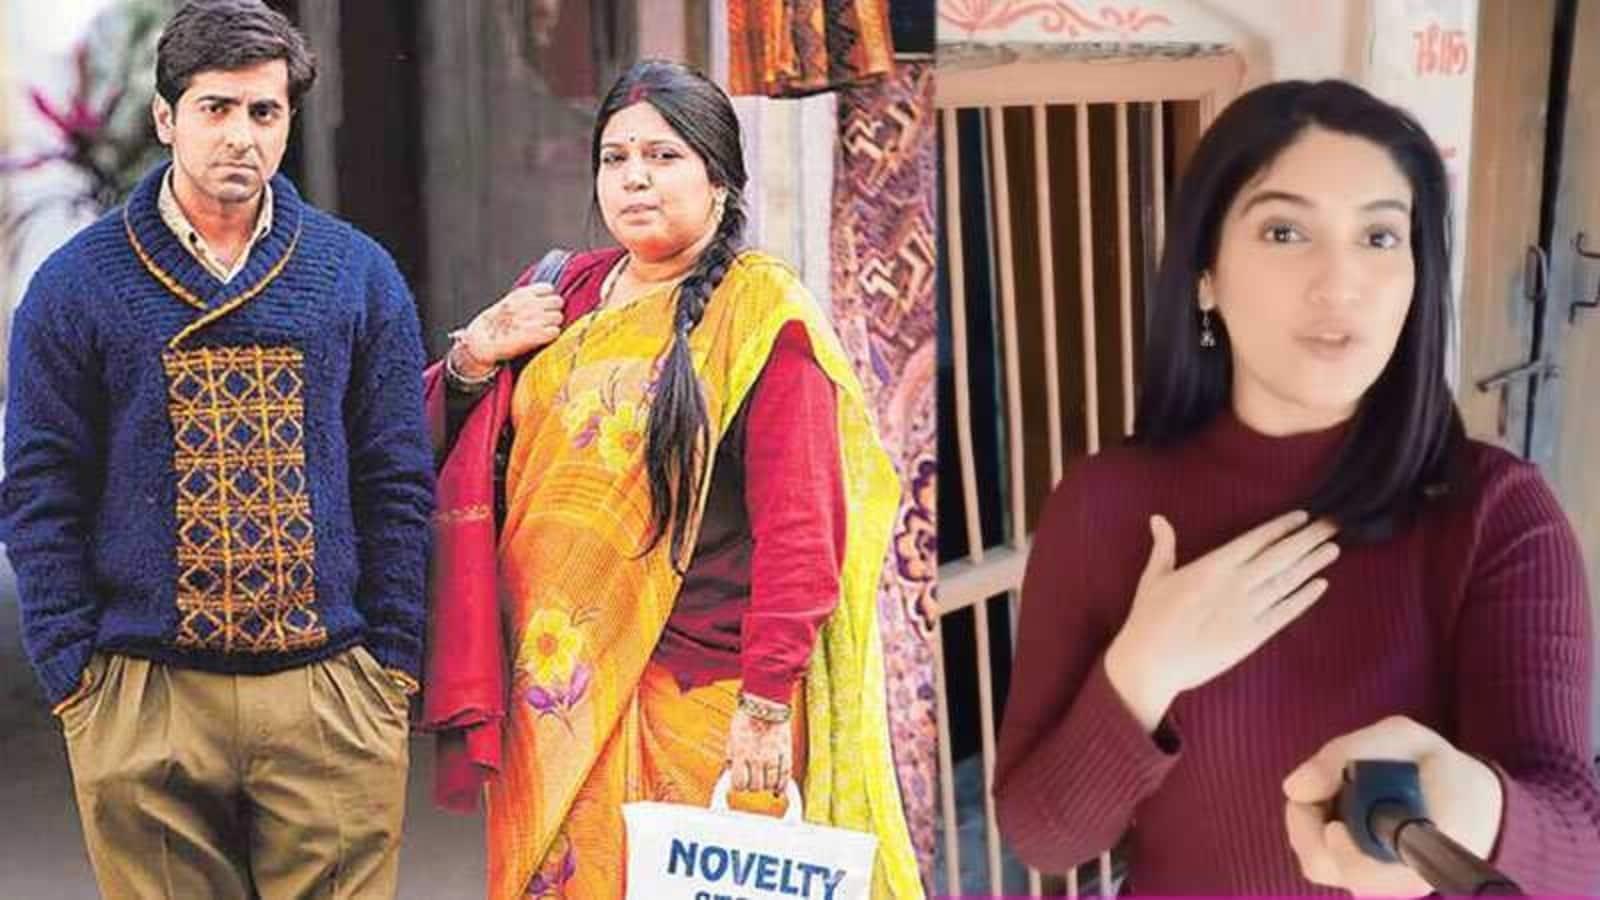 Bhumi Pednekar visits Dum Laga Ke Haisha house in Haridwar, Ayushmann Khurrana calls the film 'voice of my beliefs' - Hindustan Times